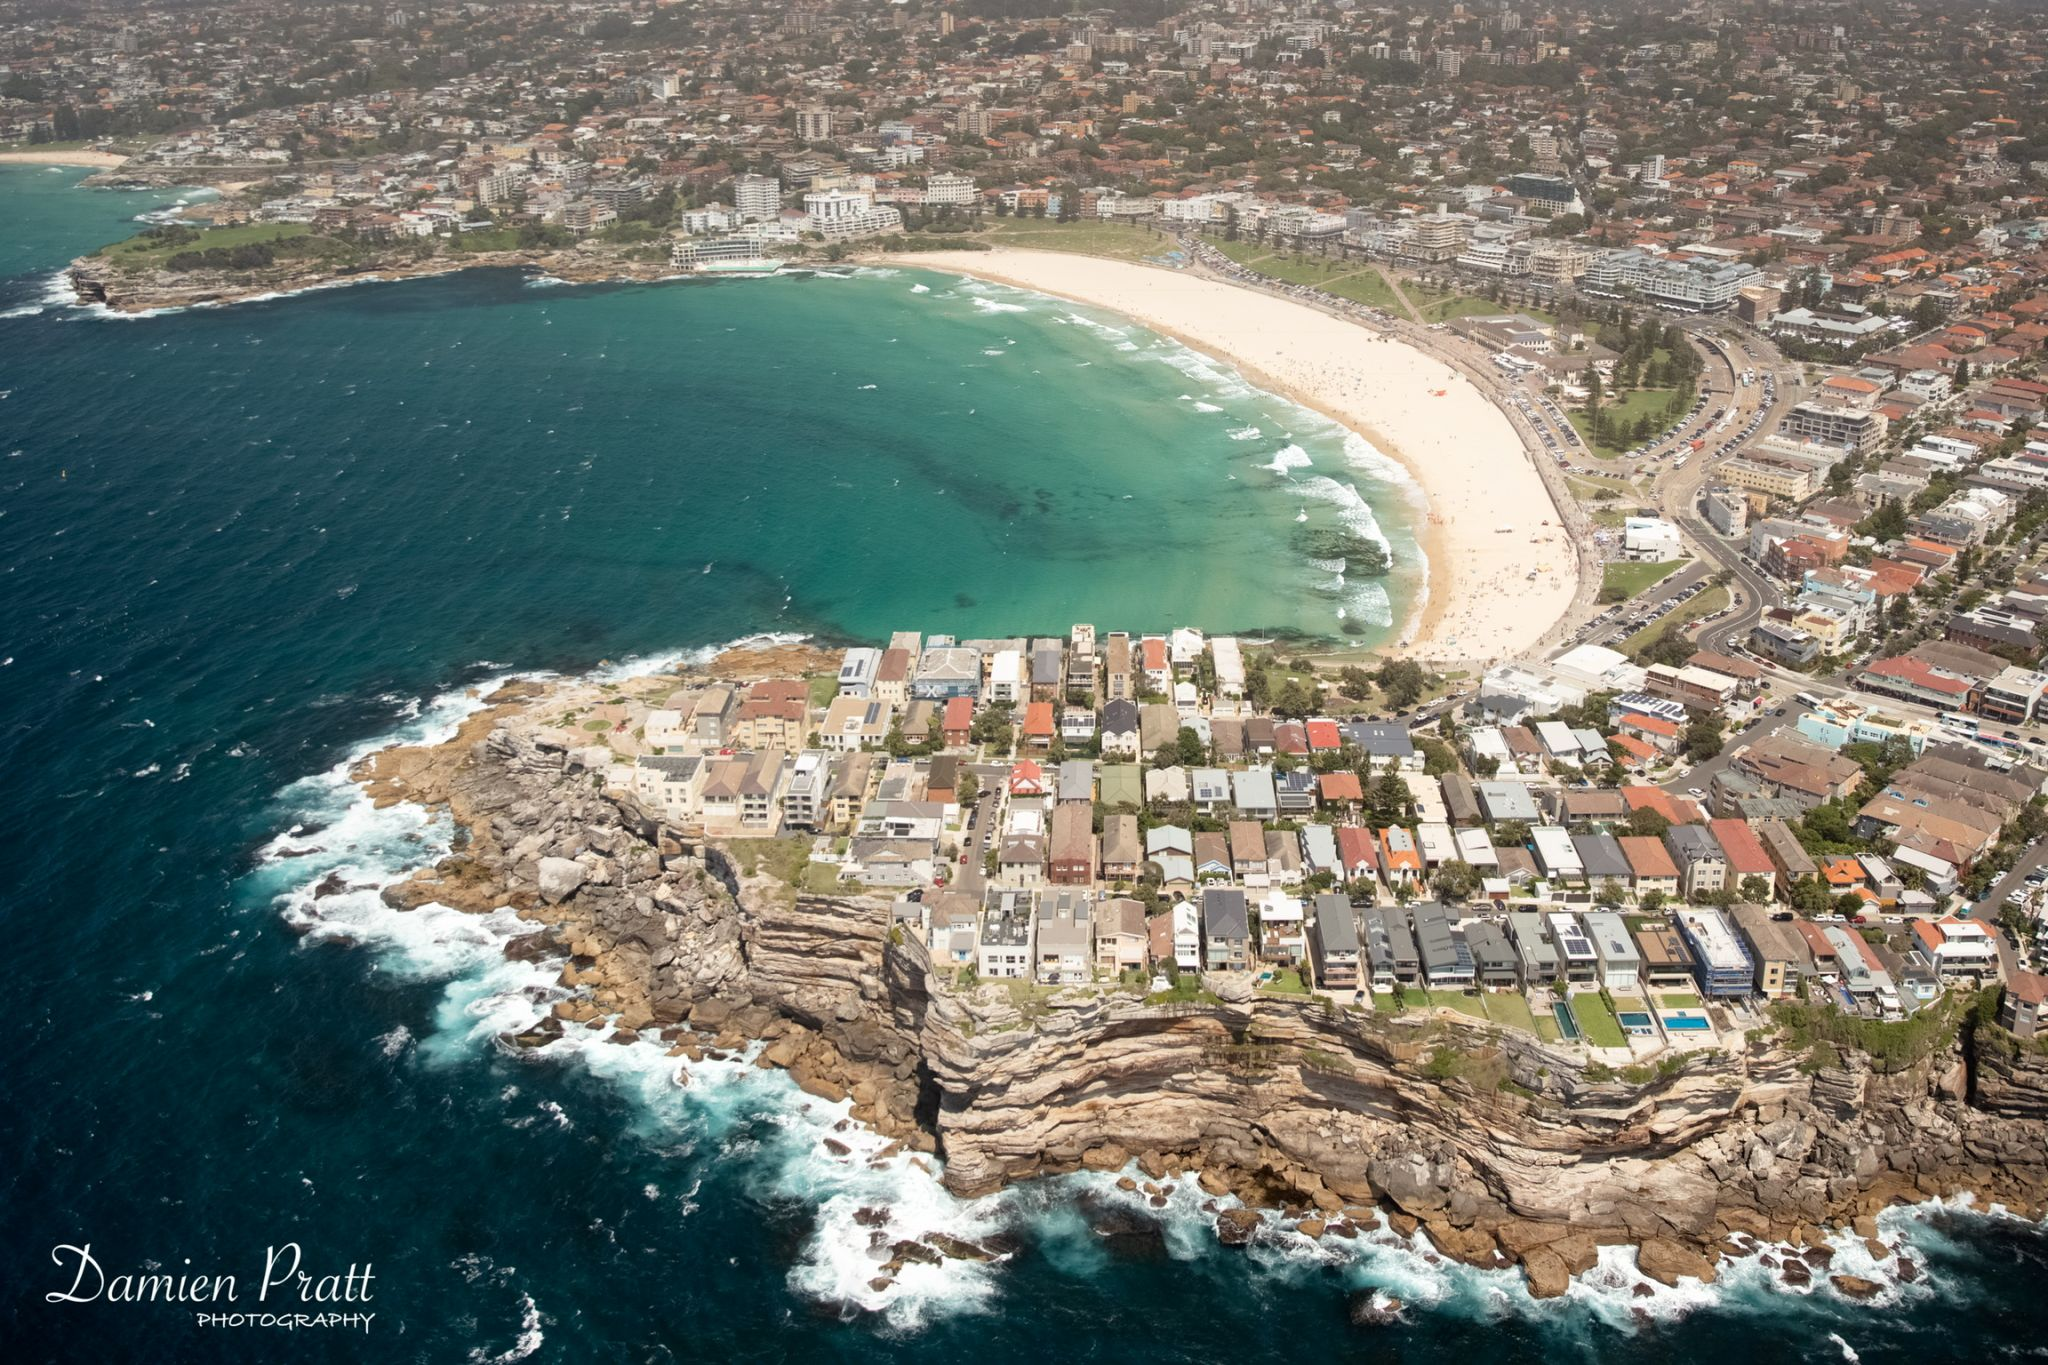 Bondi Beach aerial, Australia